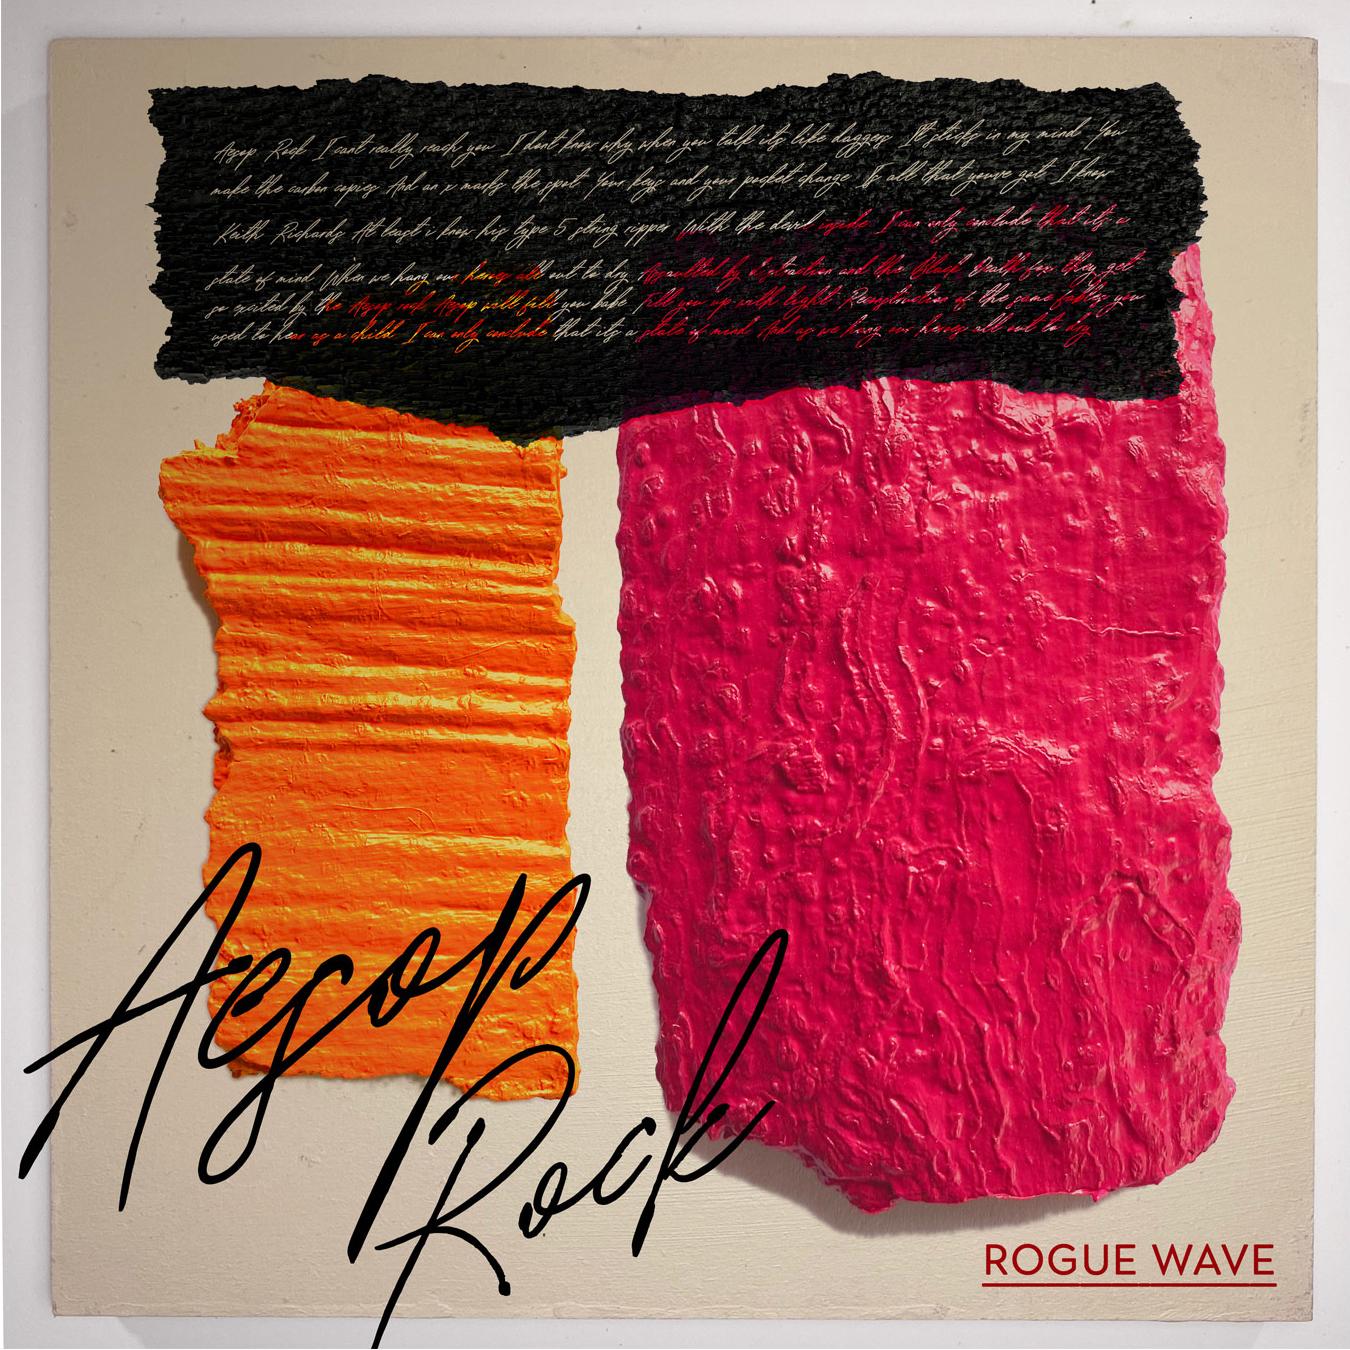 Rogue Wave - Aesop Rock